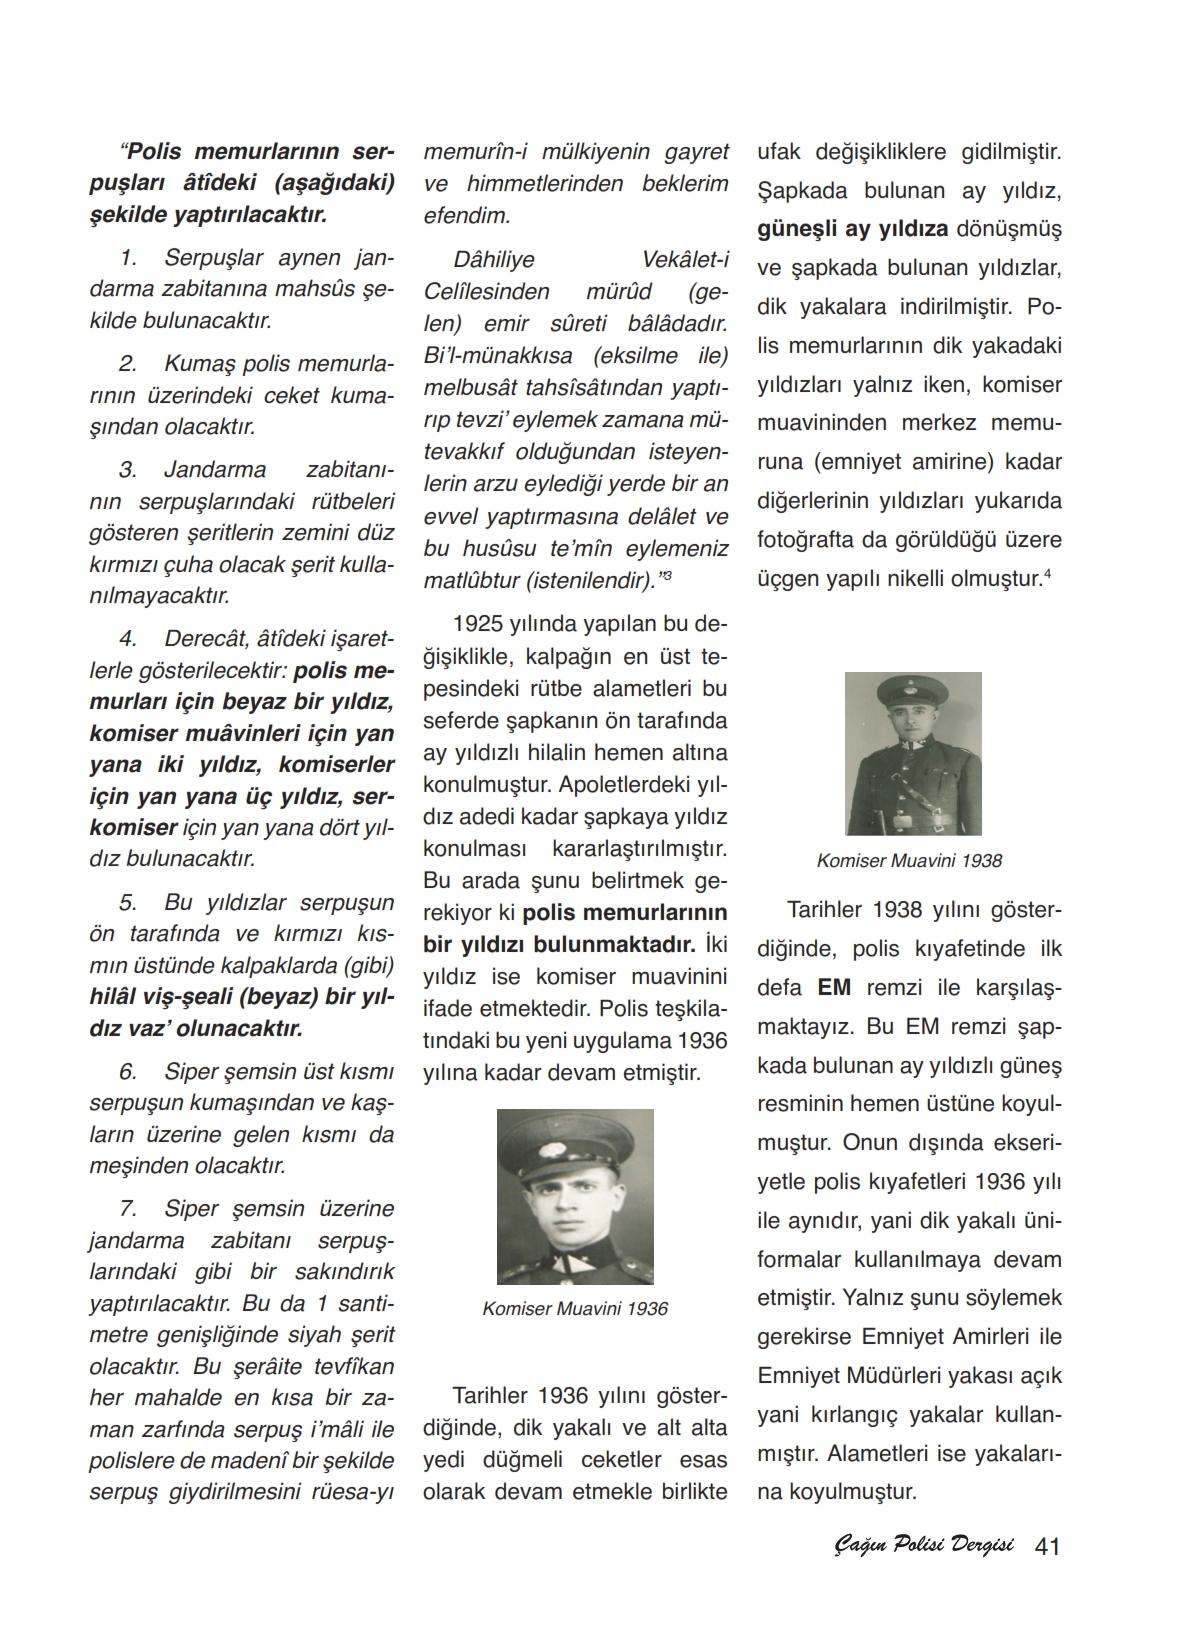 polis_dergi_aralik_2013_int_043